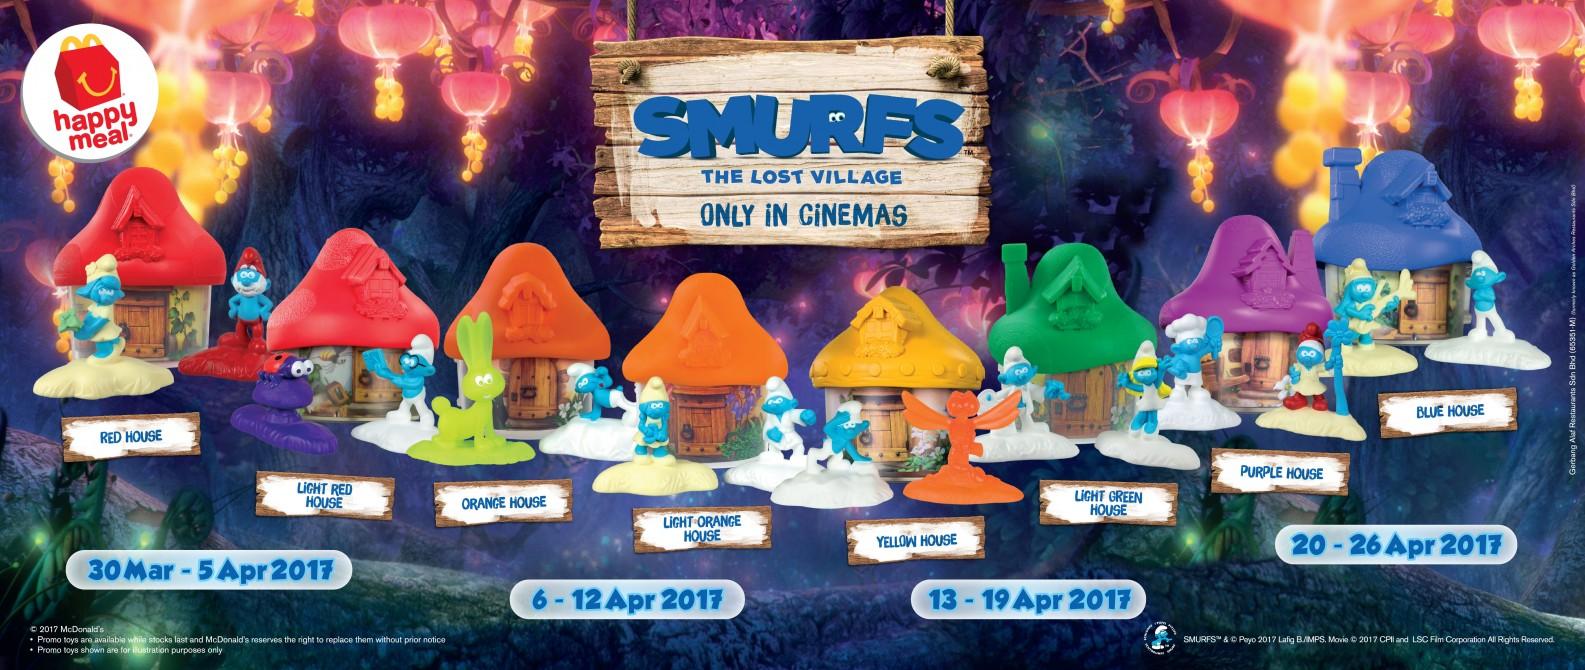 mcdonald's happy meal toy schedule 2019 - slubne-suknie info